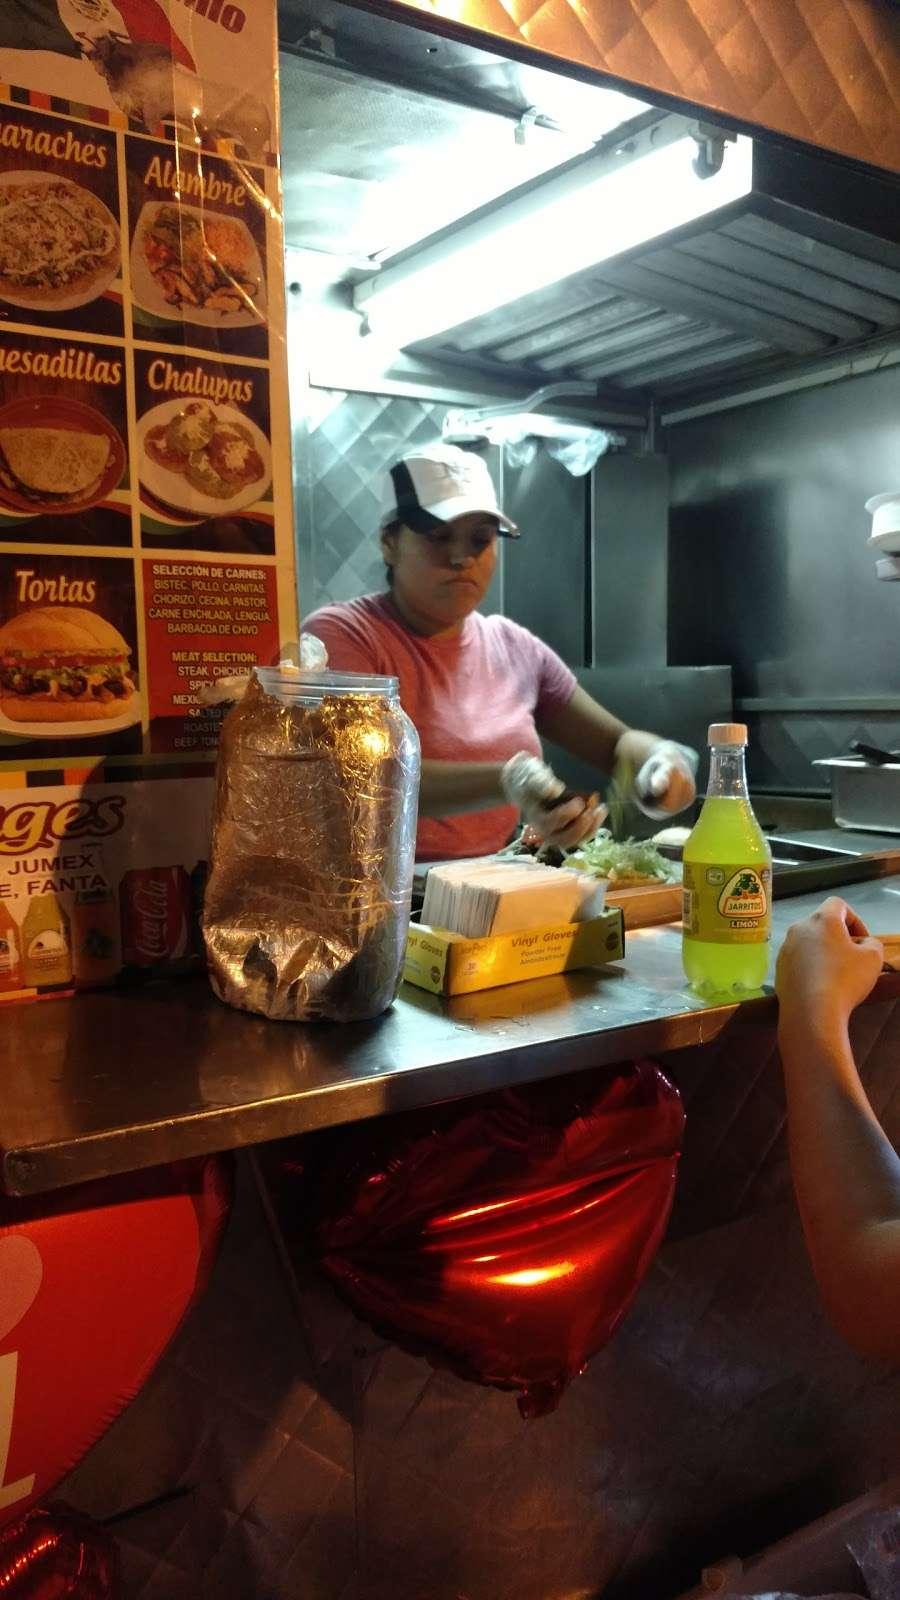 El Novillo - Antojitos Mexicanos - restaurant  | Photo 7 of 8 | Address: 40-0 Prince St, Flushing, NY 11354, USA